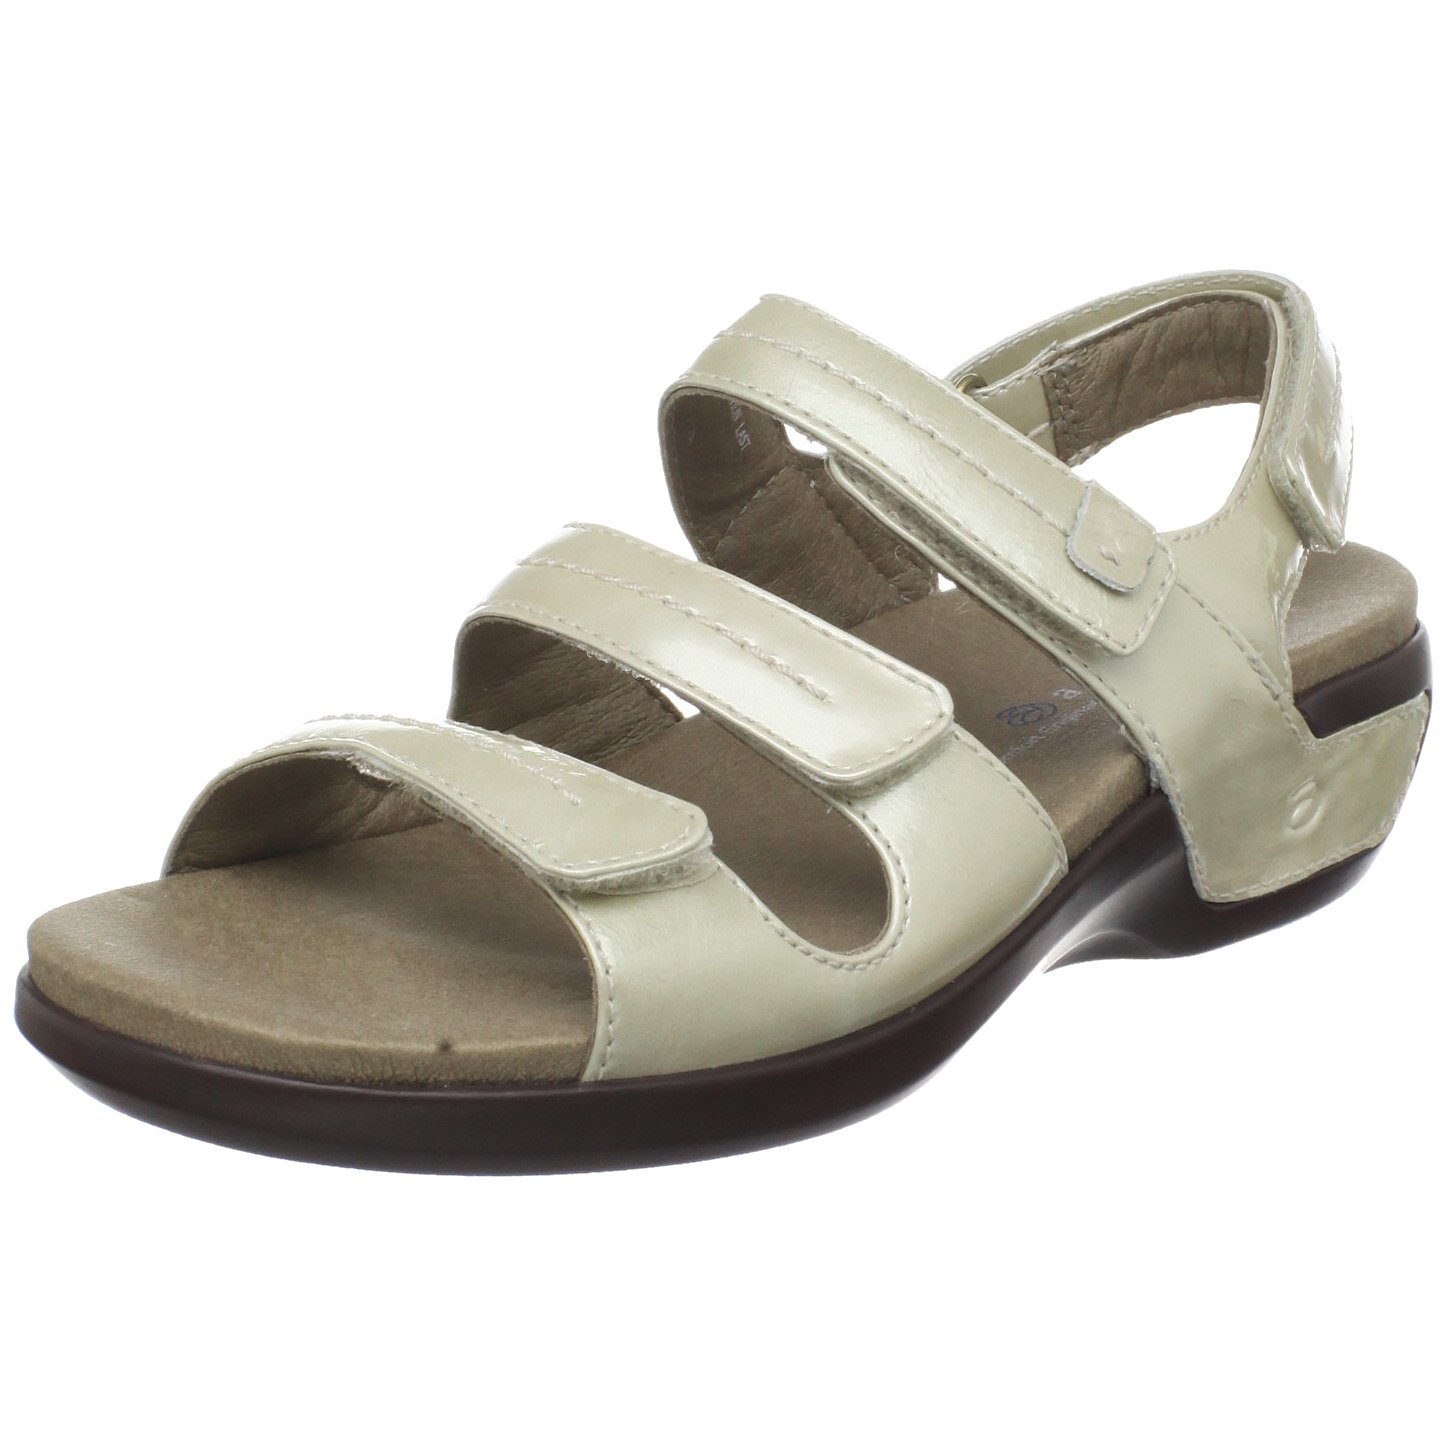 Aravon Women's Keri Wedge Sandal B003WON1G6 10 B(M) US|Beige